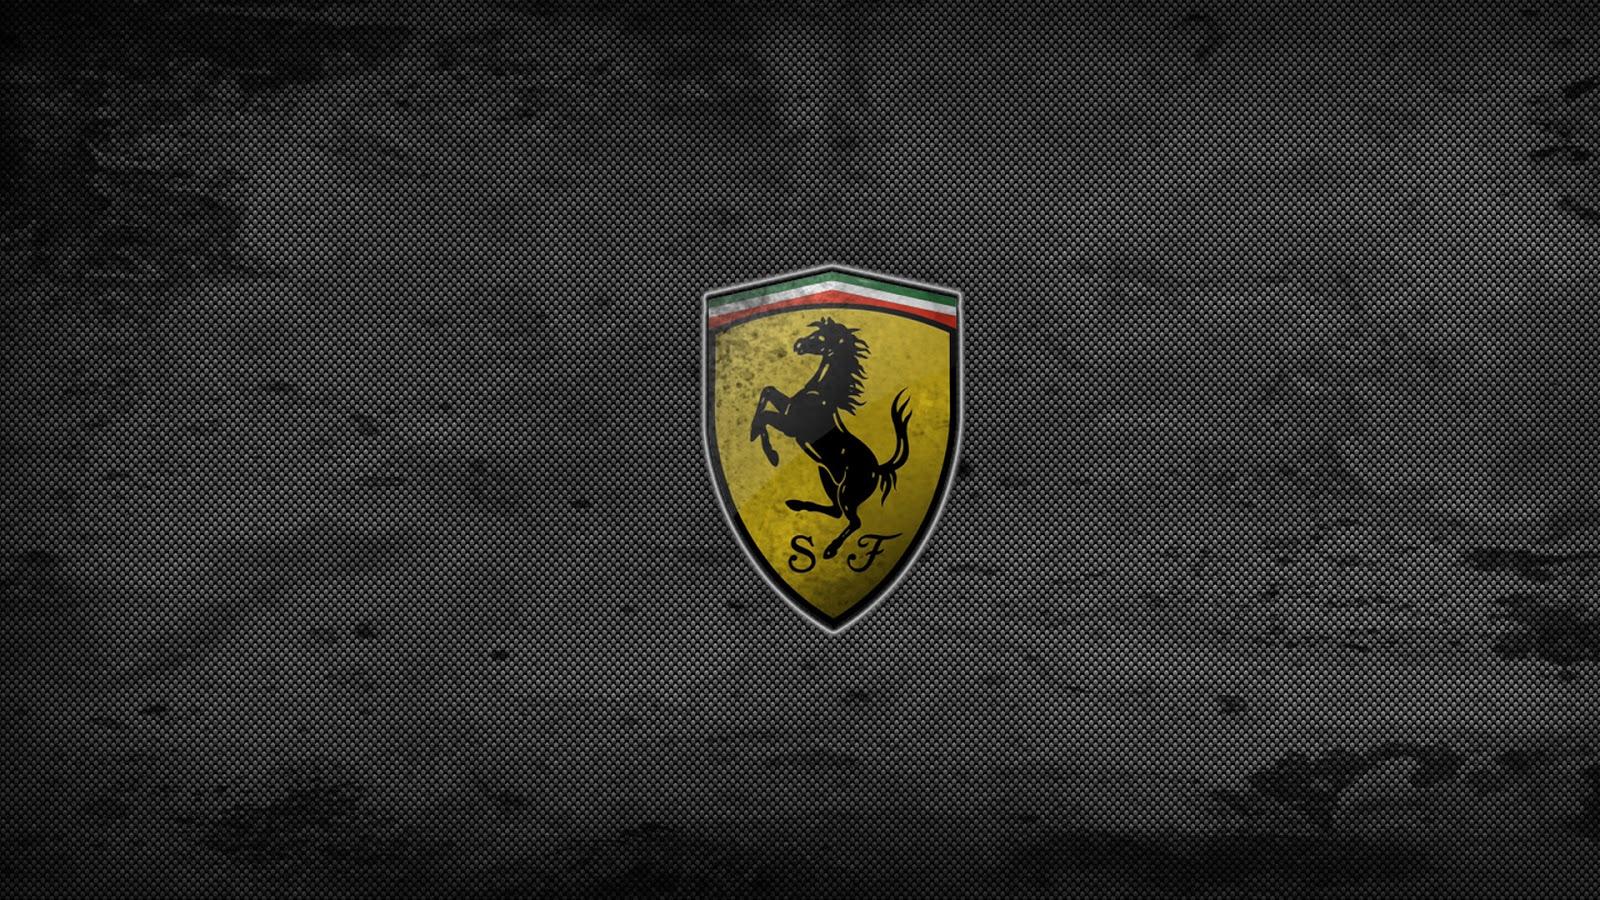 ferrari logo | hd wallpapers (high definition) | free background